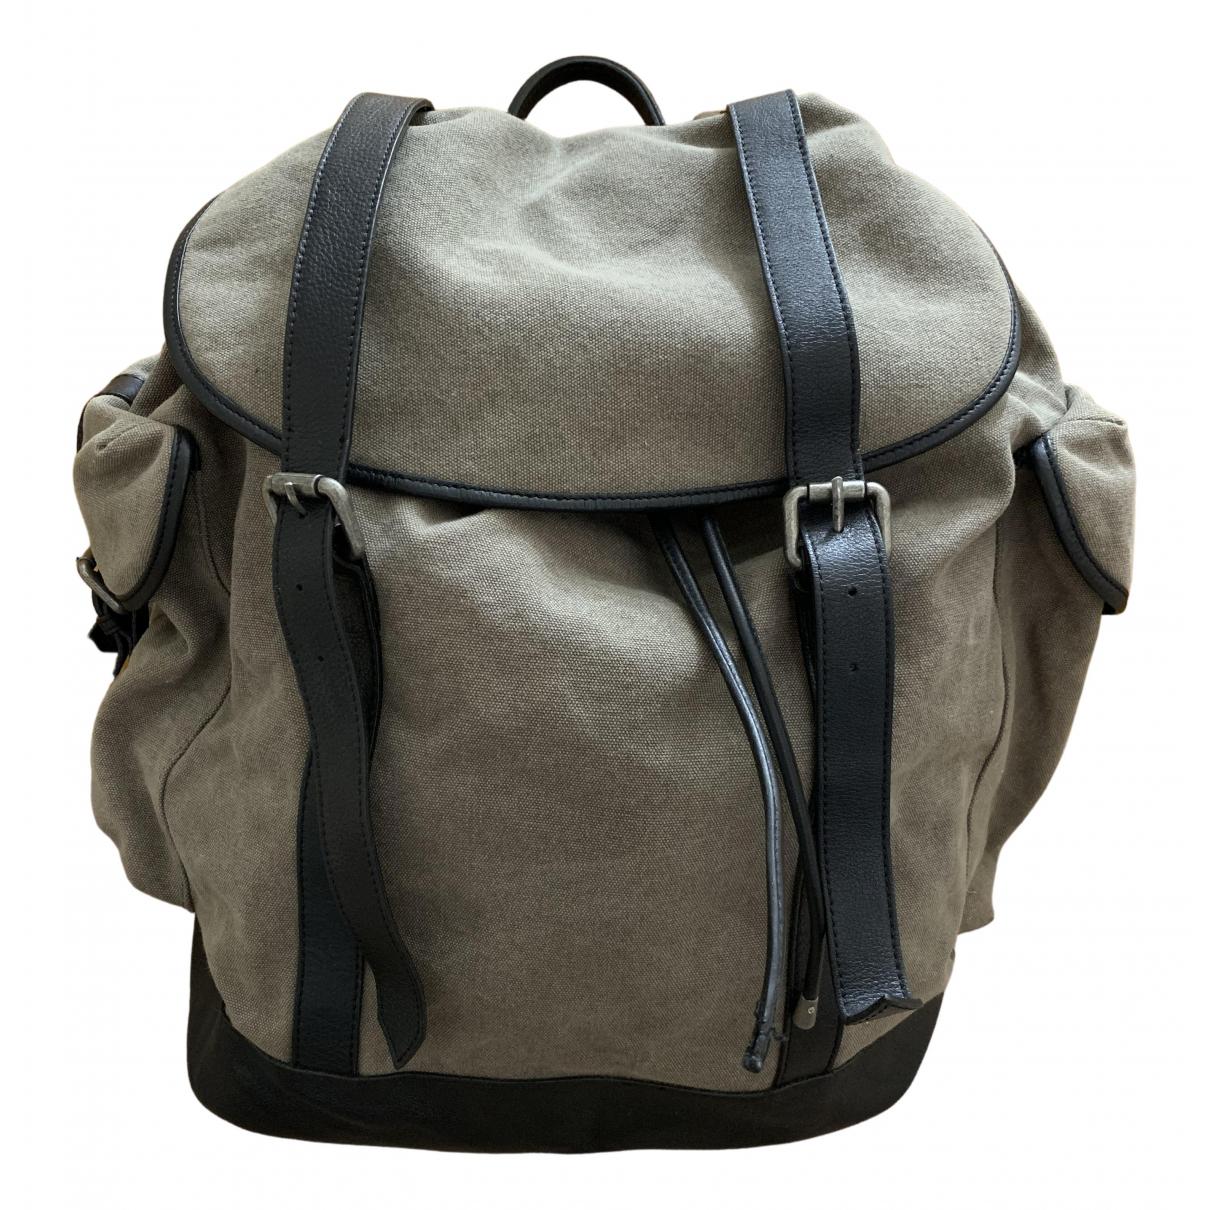 The Kooples N Khaki Cotton bag for Men N